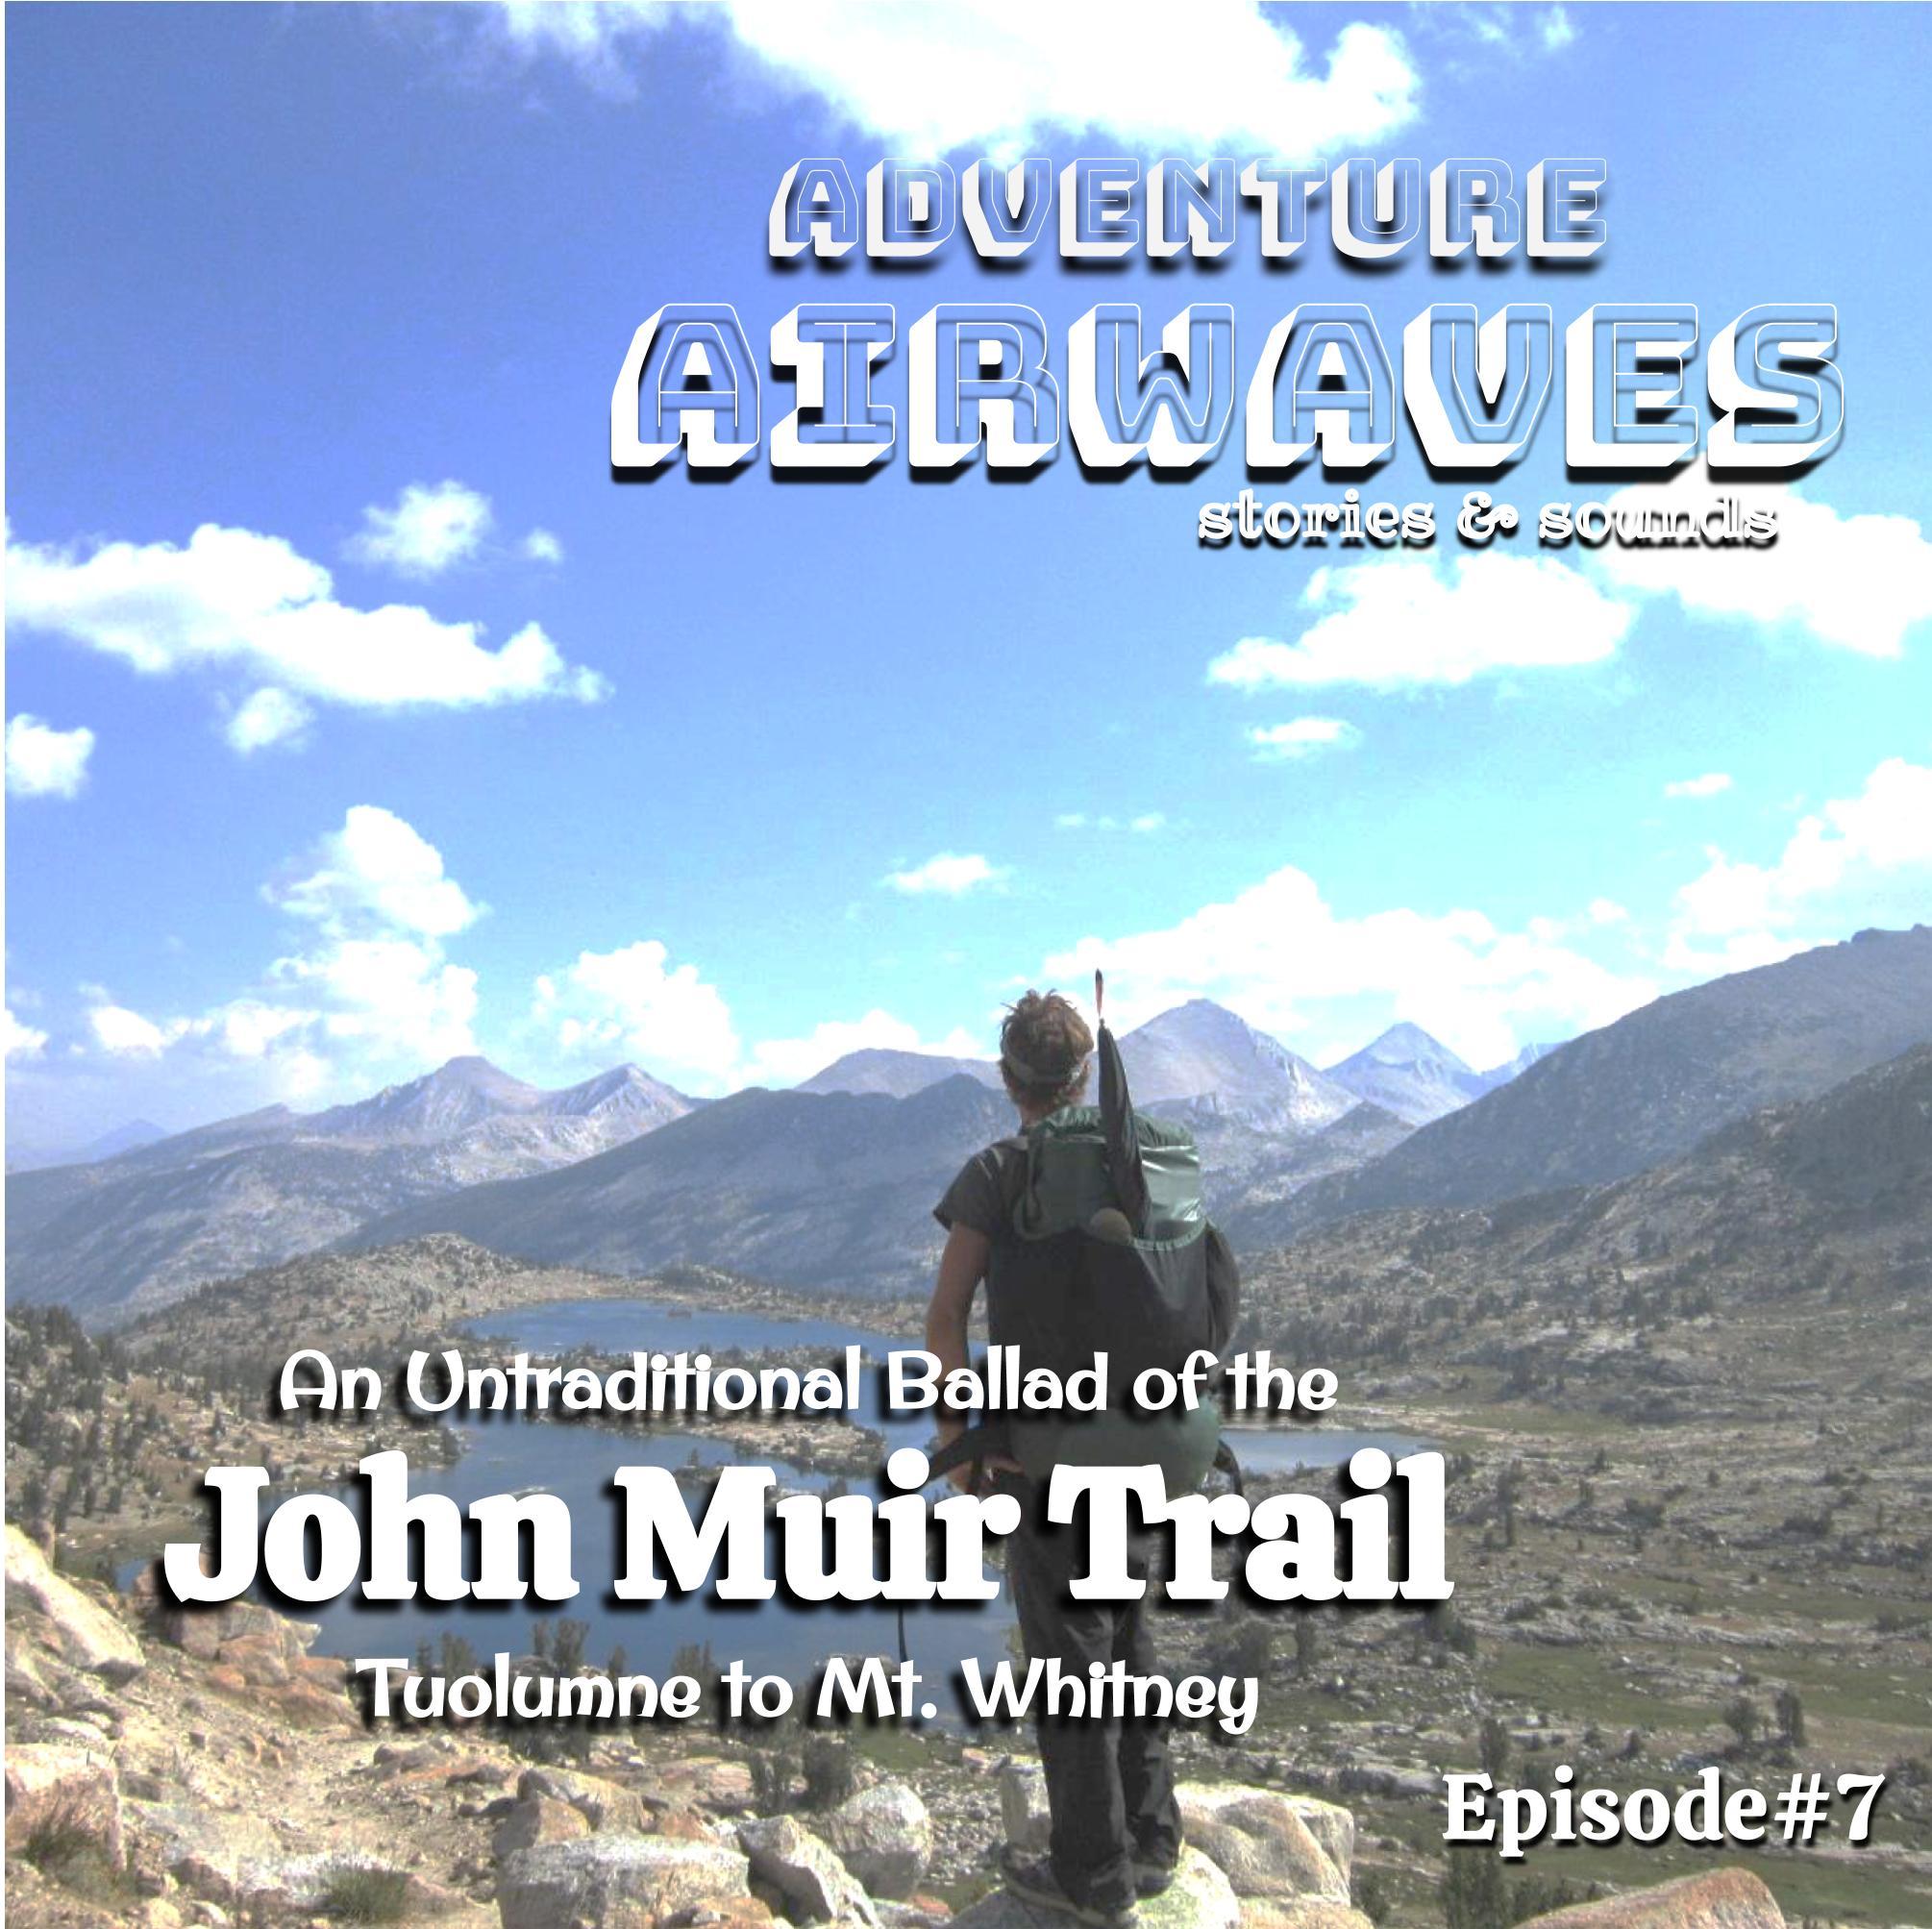 A Ballad of the John Muir Trail - Tuolumne to Mt. Whitney